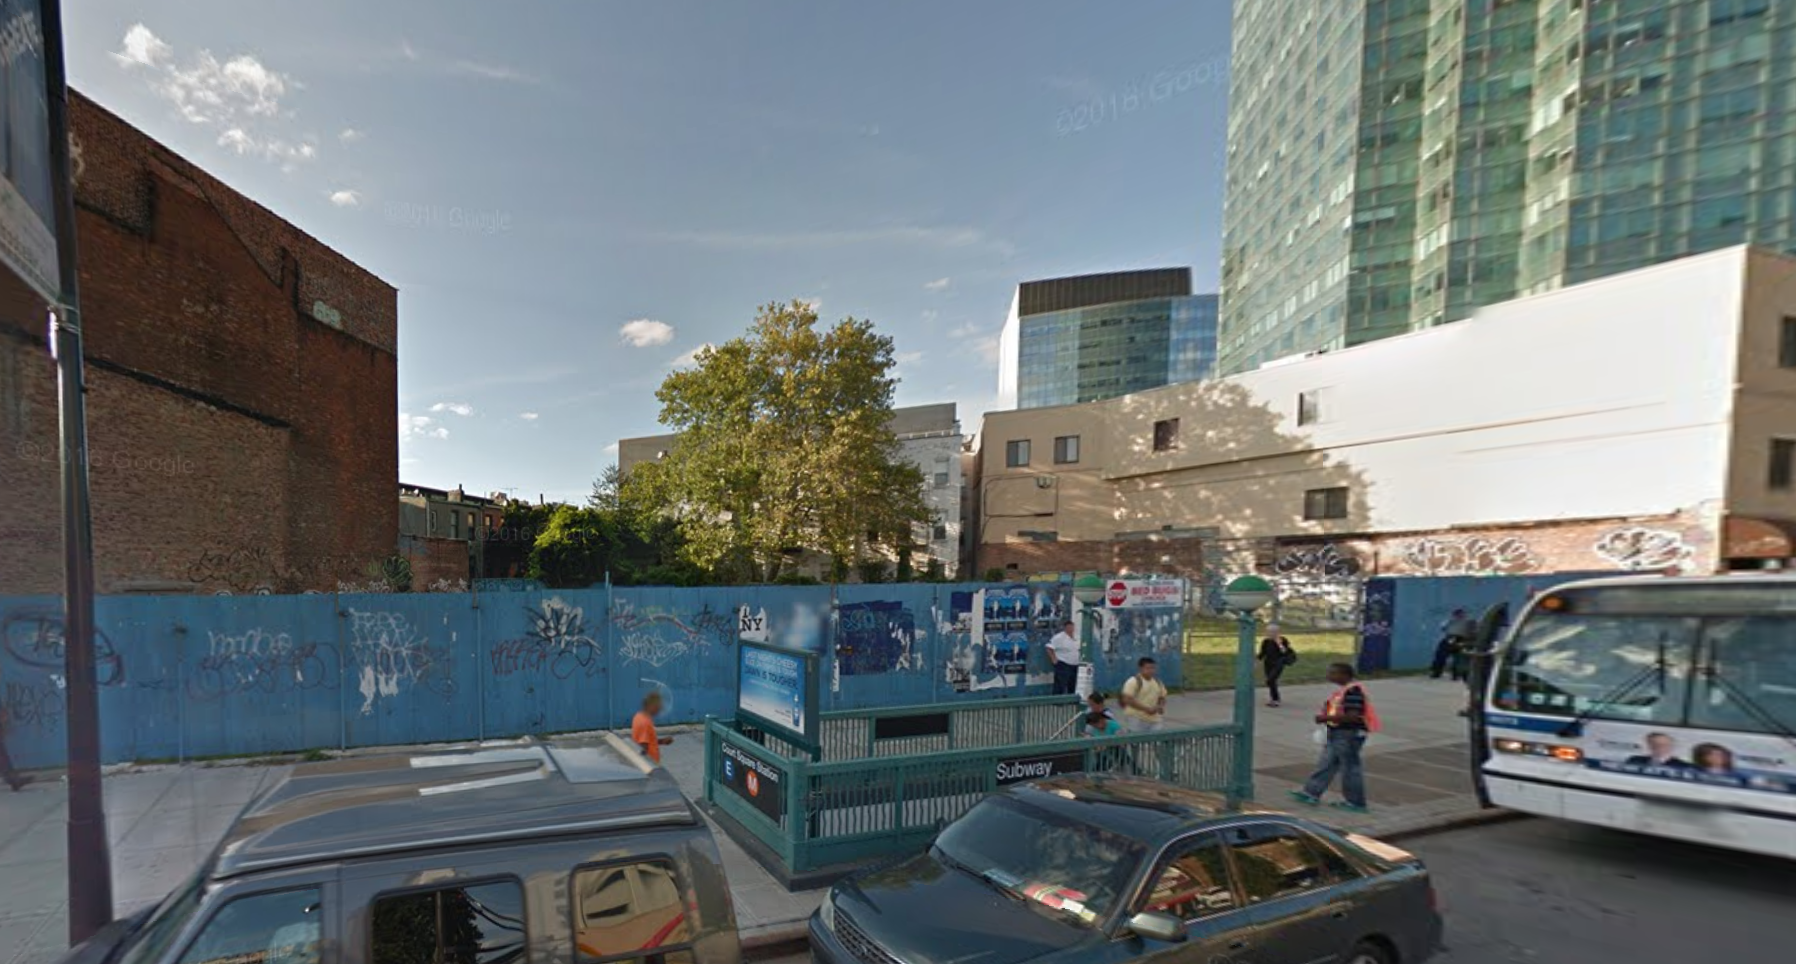 24-09 Jackson Avenue, image via Google Maps